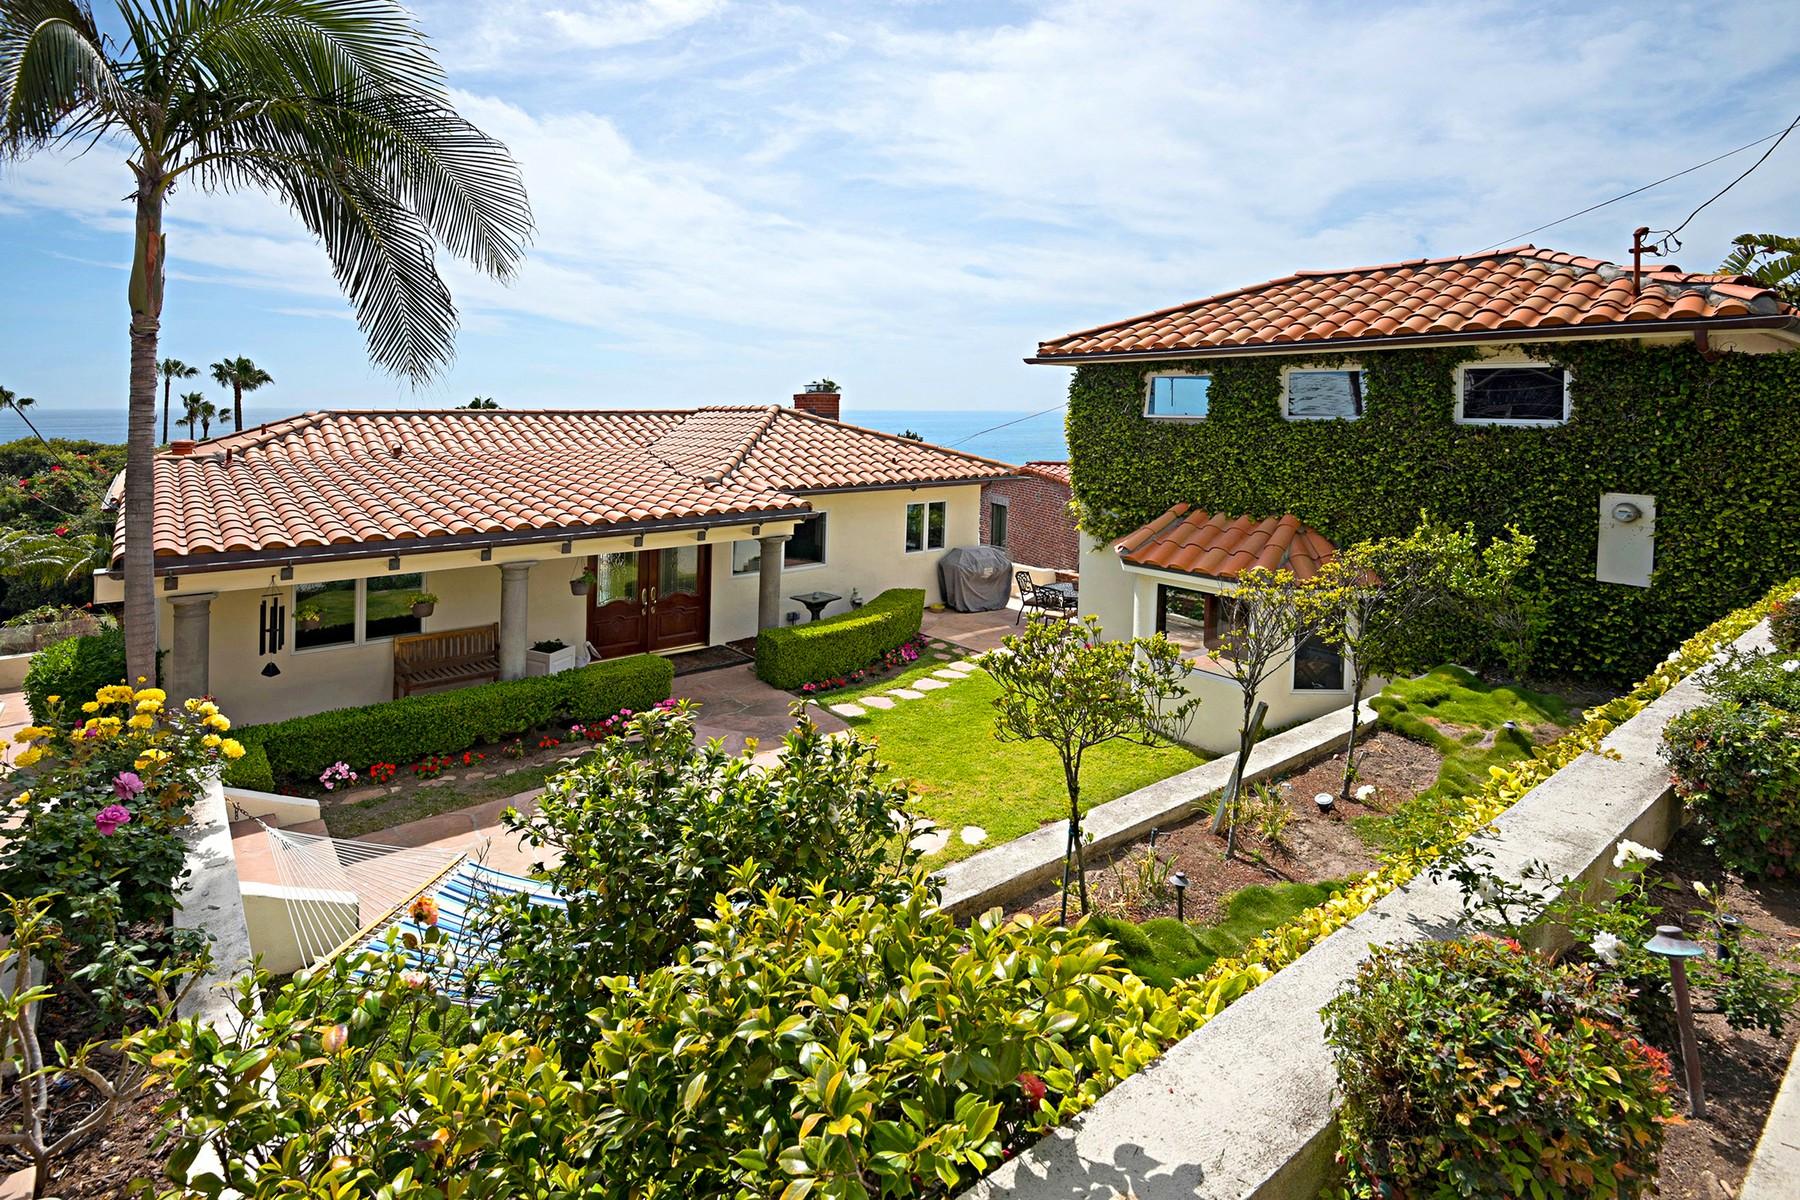 Single Family Home for Sale at 31281 Monterey St. Laguna Beach, California, 92651 United States